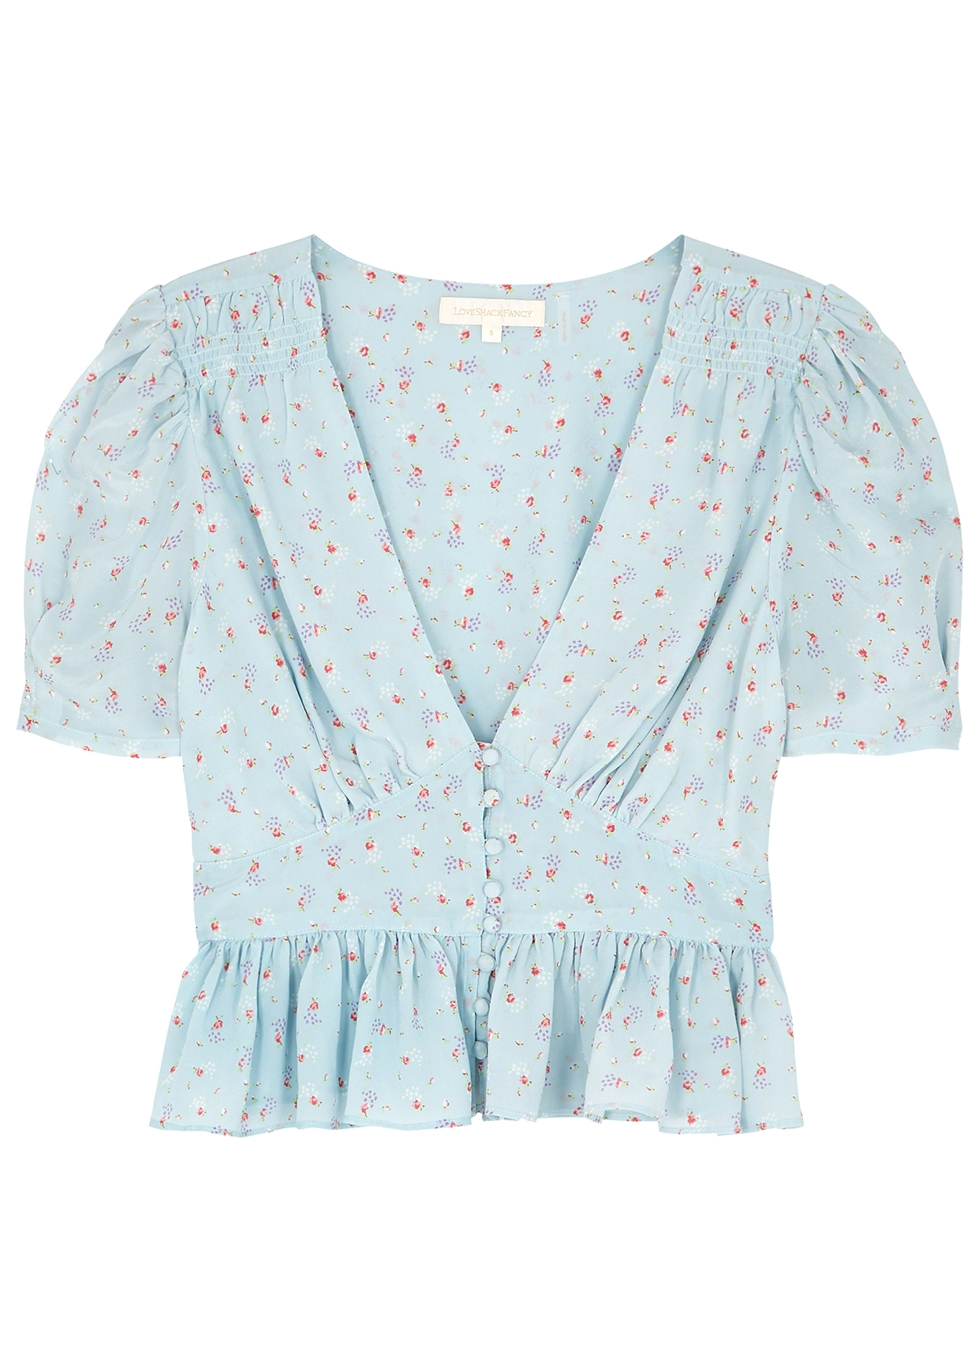 Steph floral-print light blue silk top - LoveShackFancy